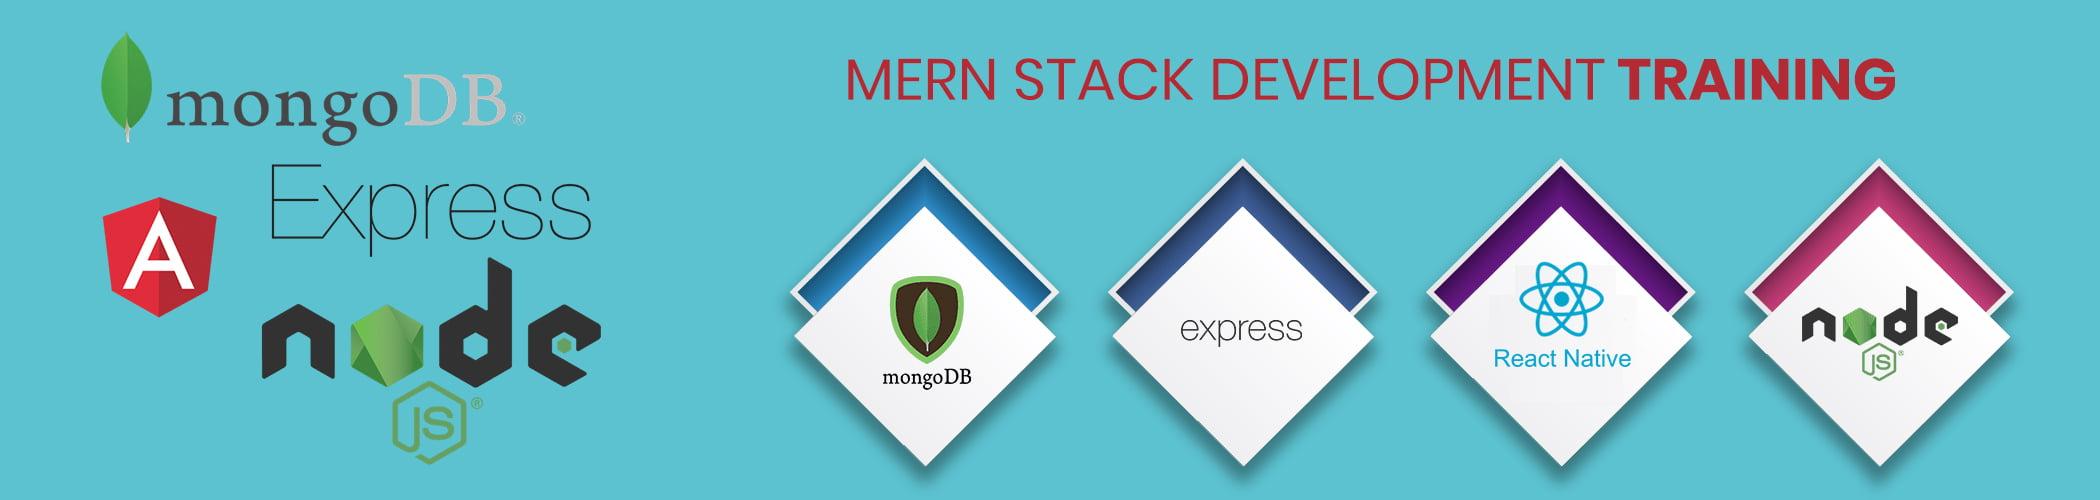 mern-stack-banner